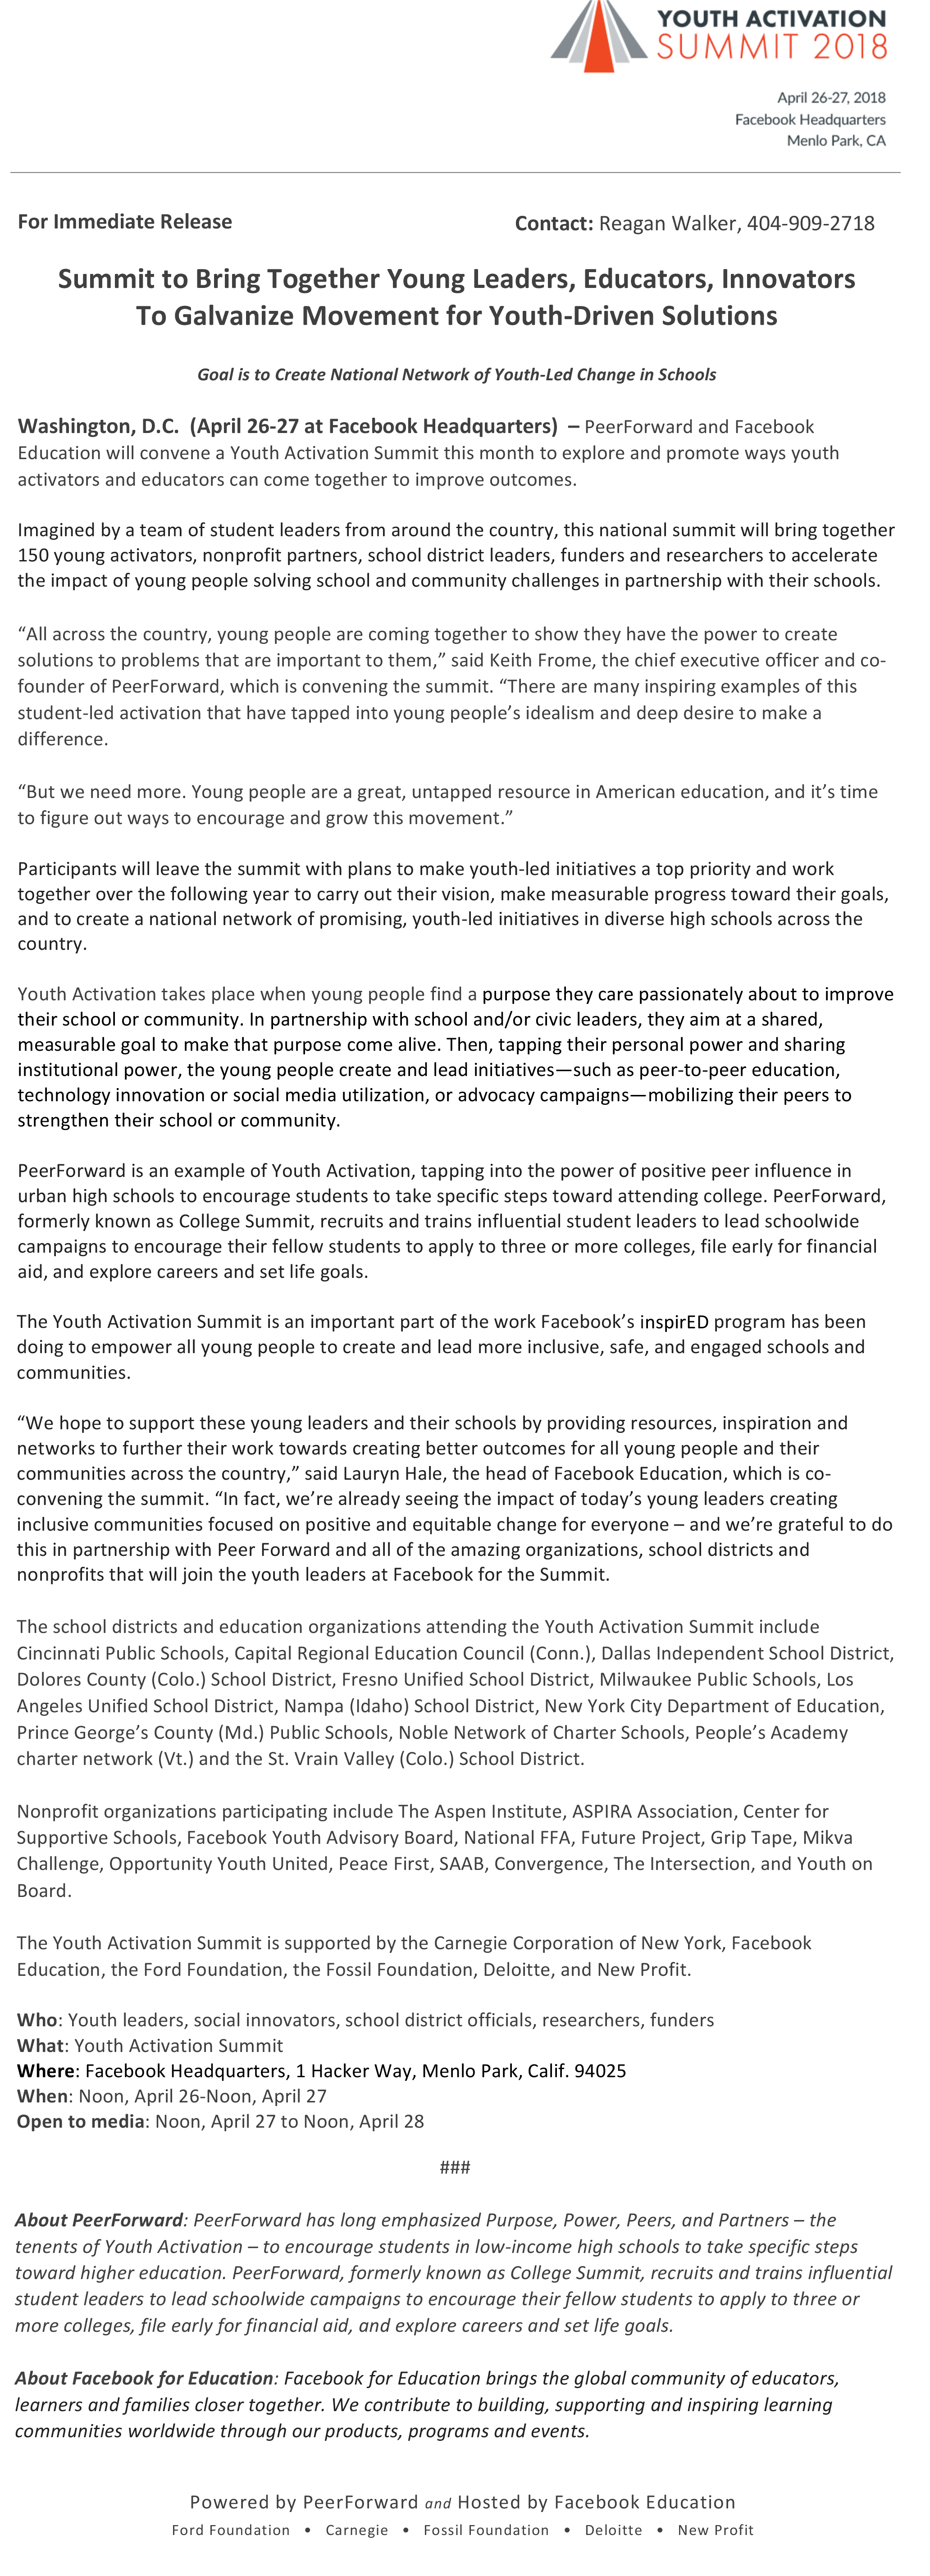 2018 YAS press release-1